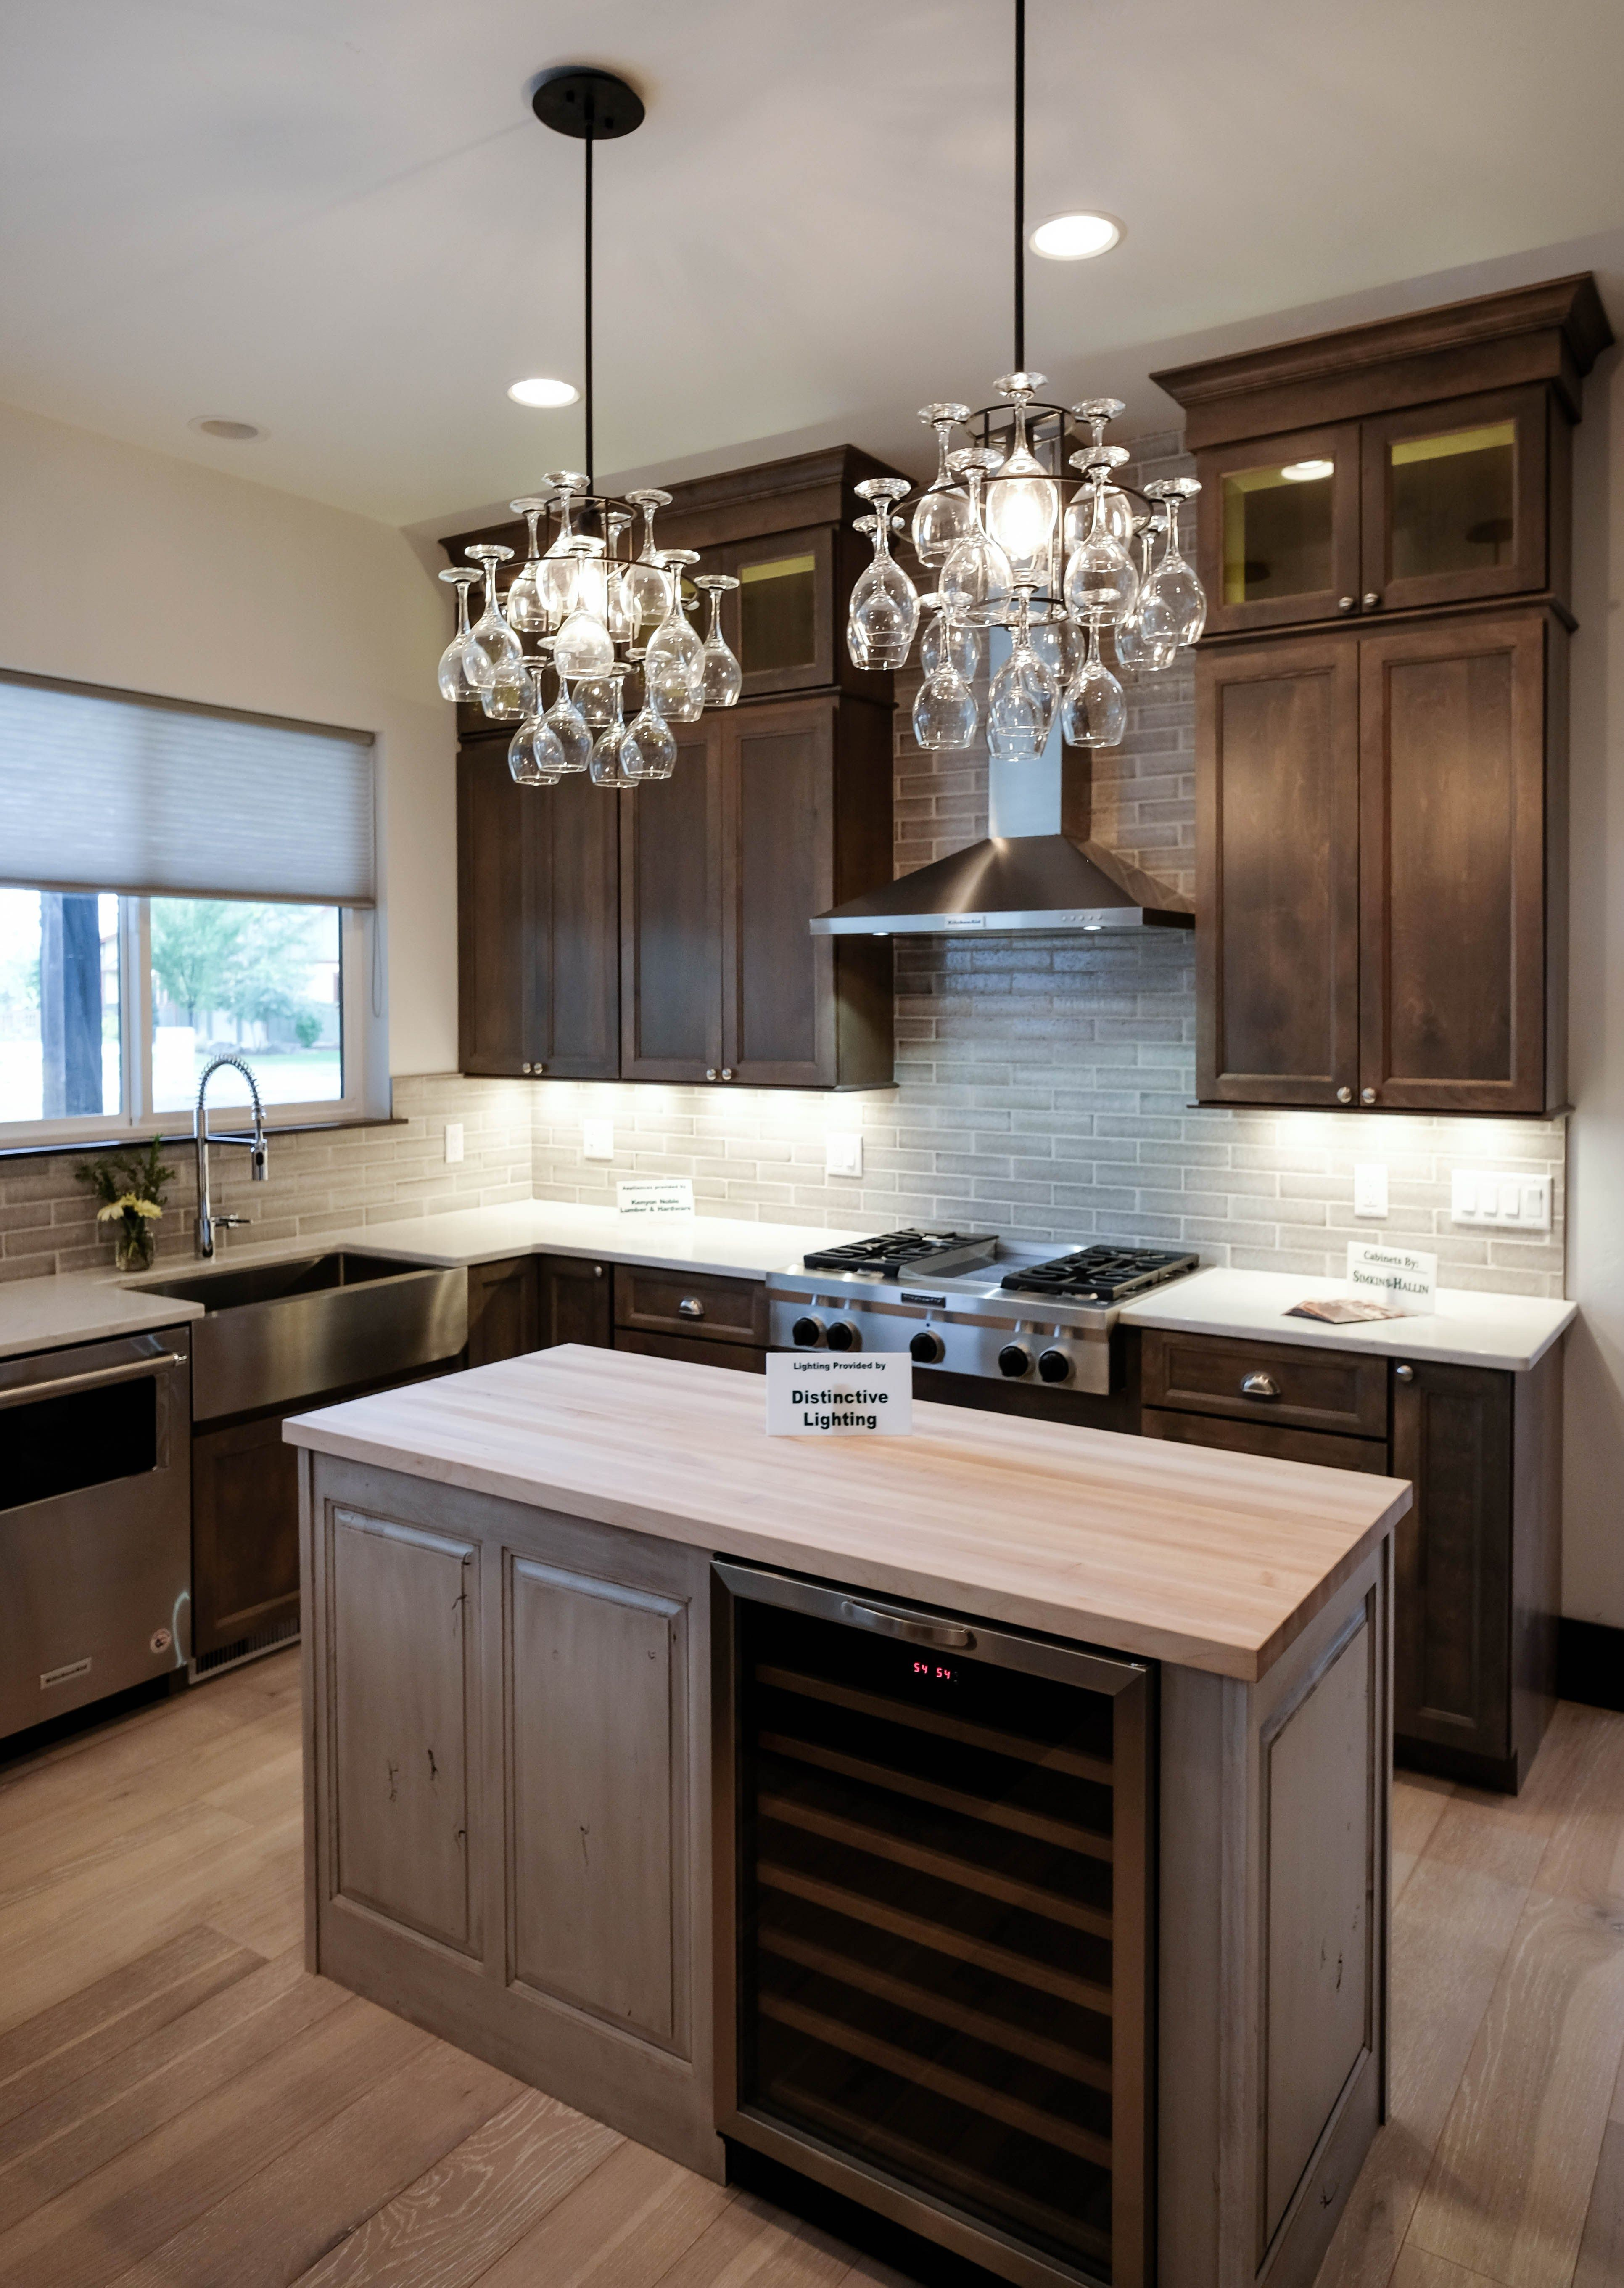 Beautiful Non White Kitchen Beautiful Non White Kitchen not